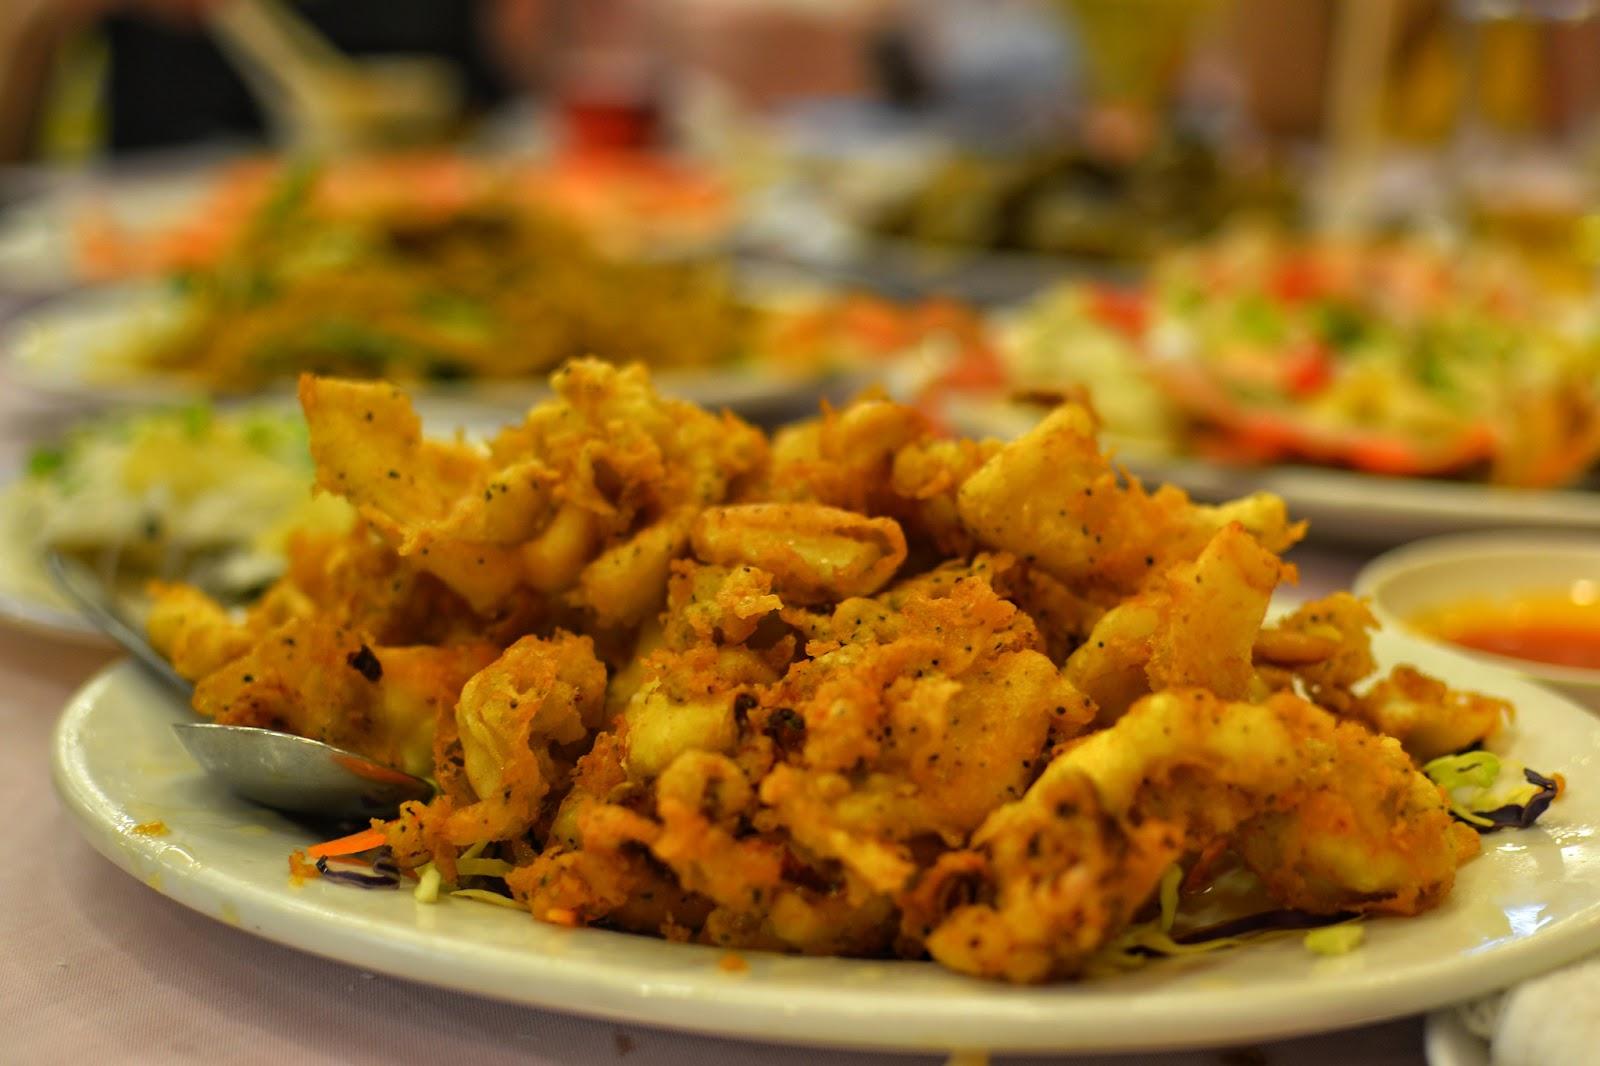 Lamma Hilton Shum Kee Seafood Restaurant